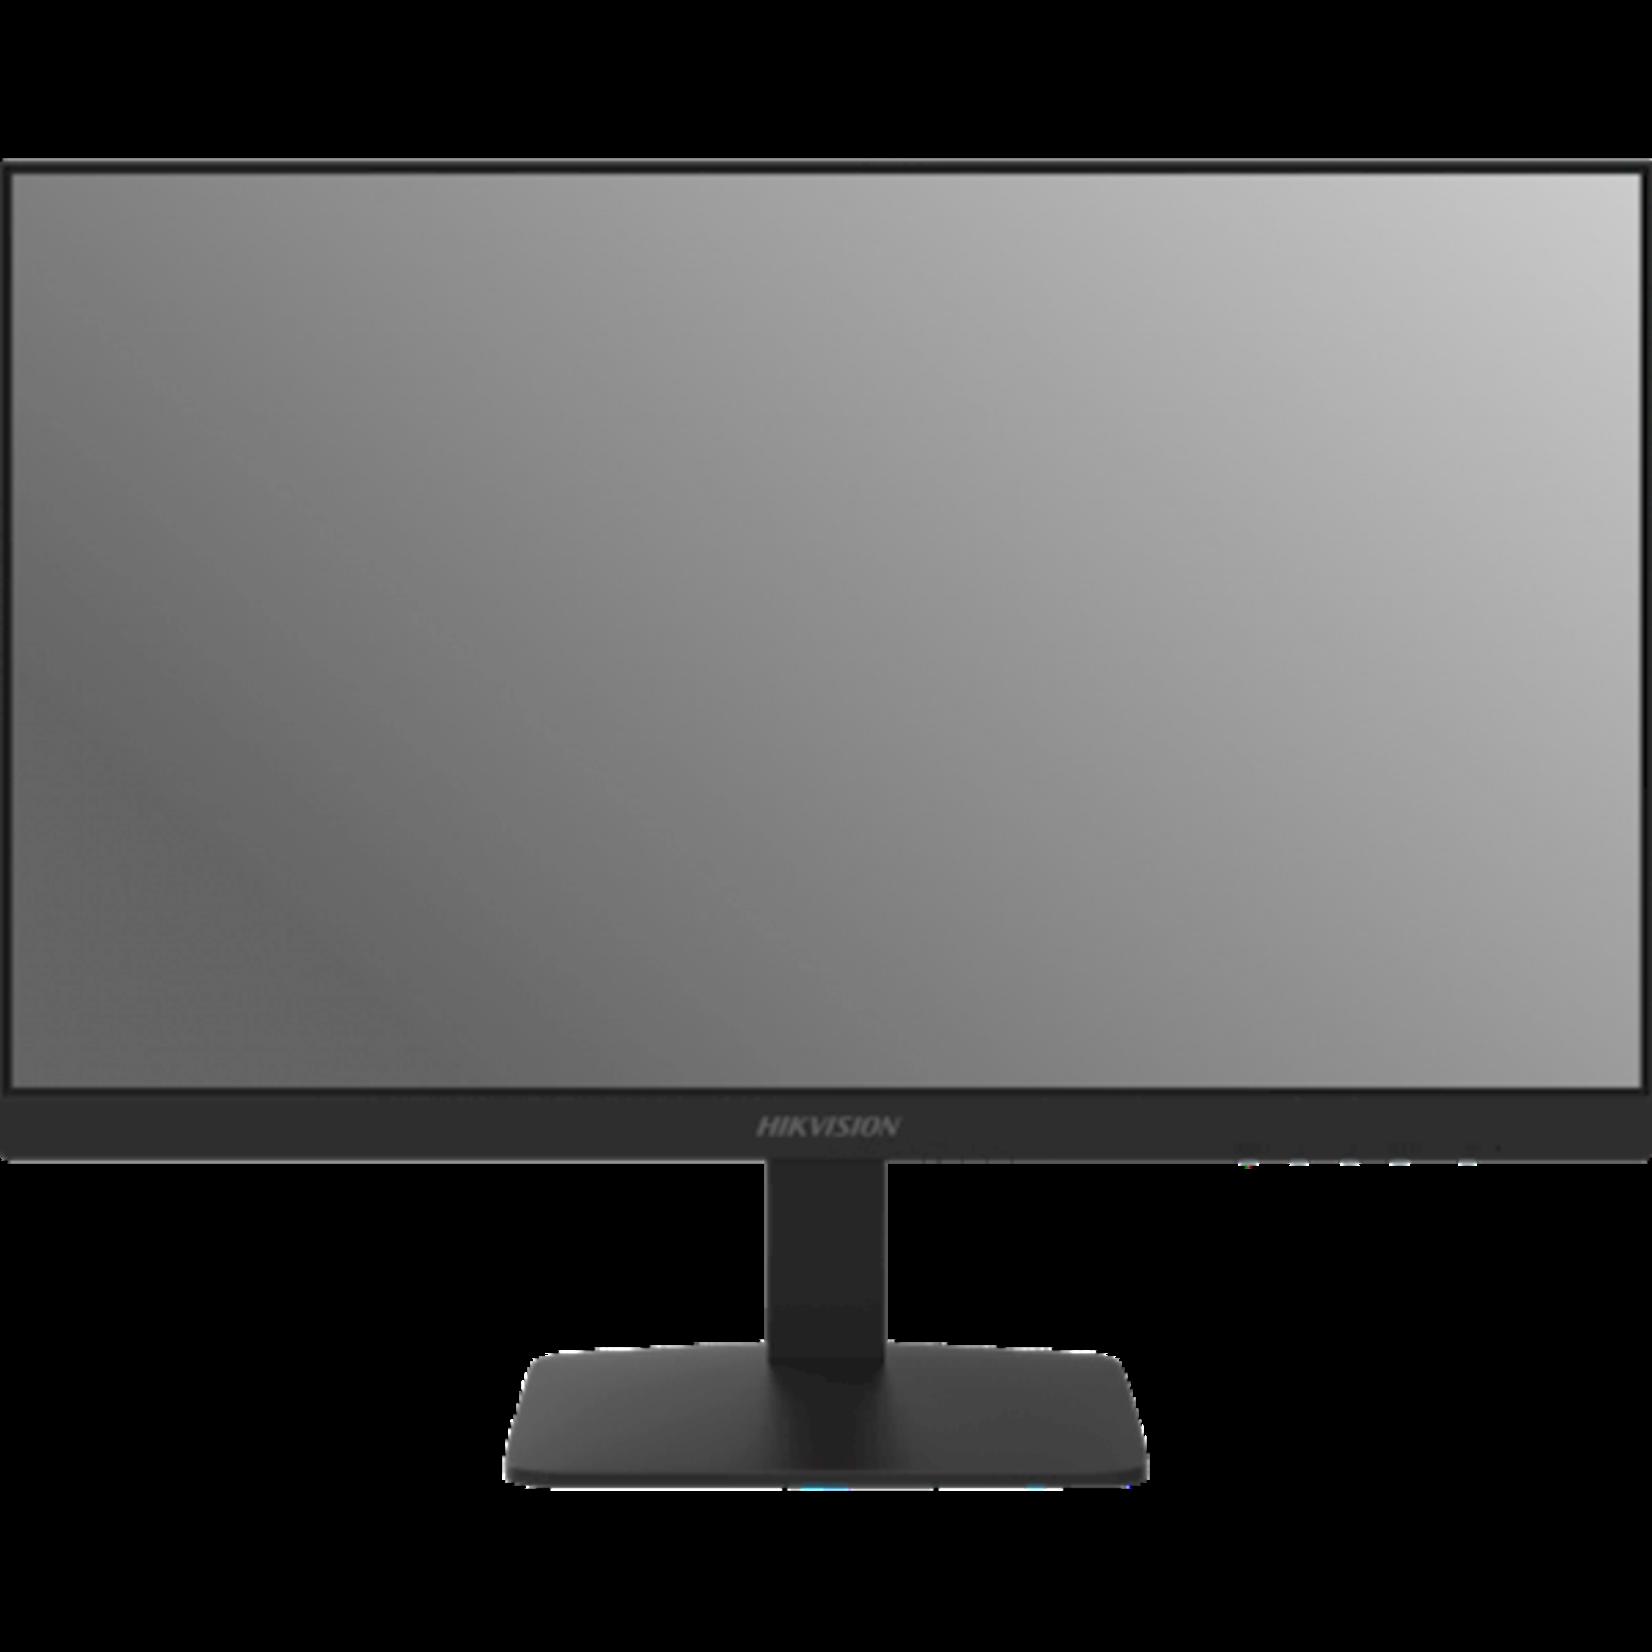 "Hikvision DS-D5027FN, 27"" LED Monitor"